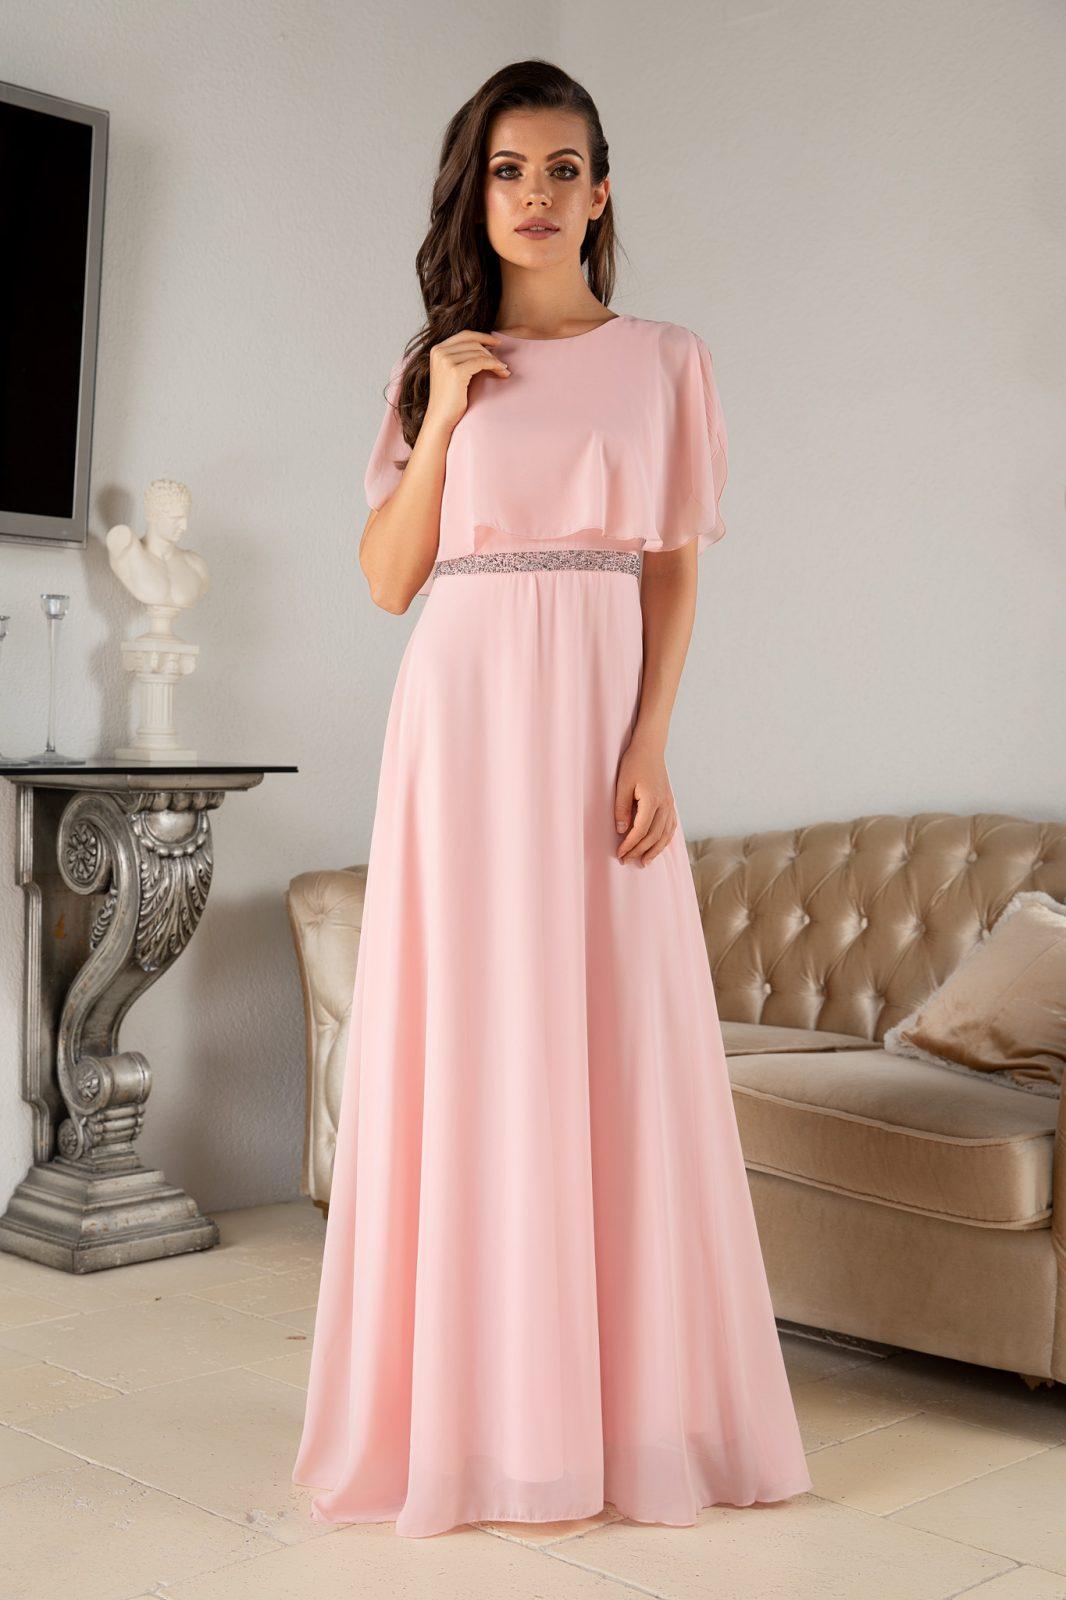 Giovanna Peach Dress